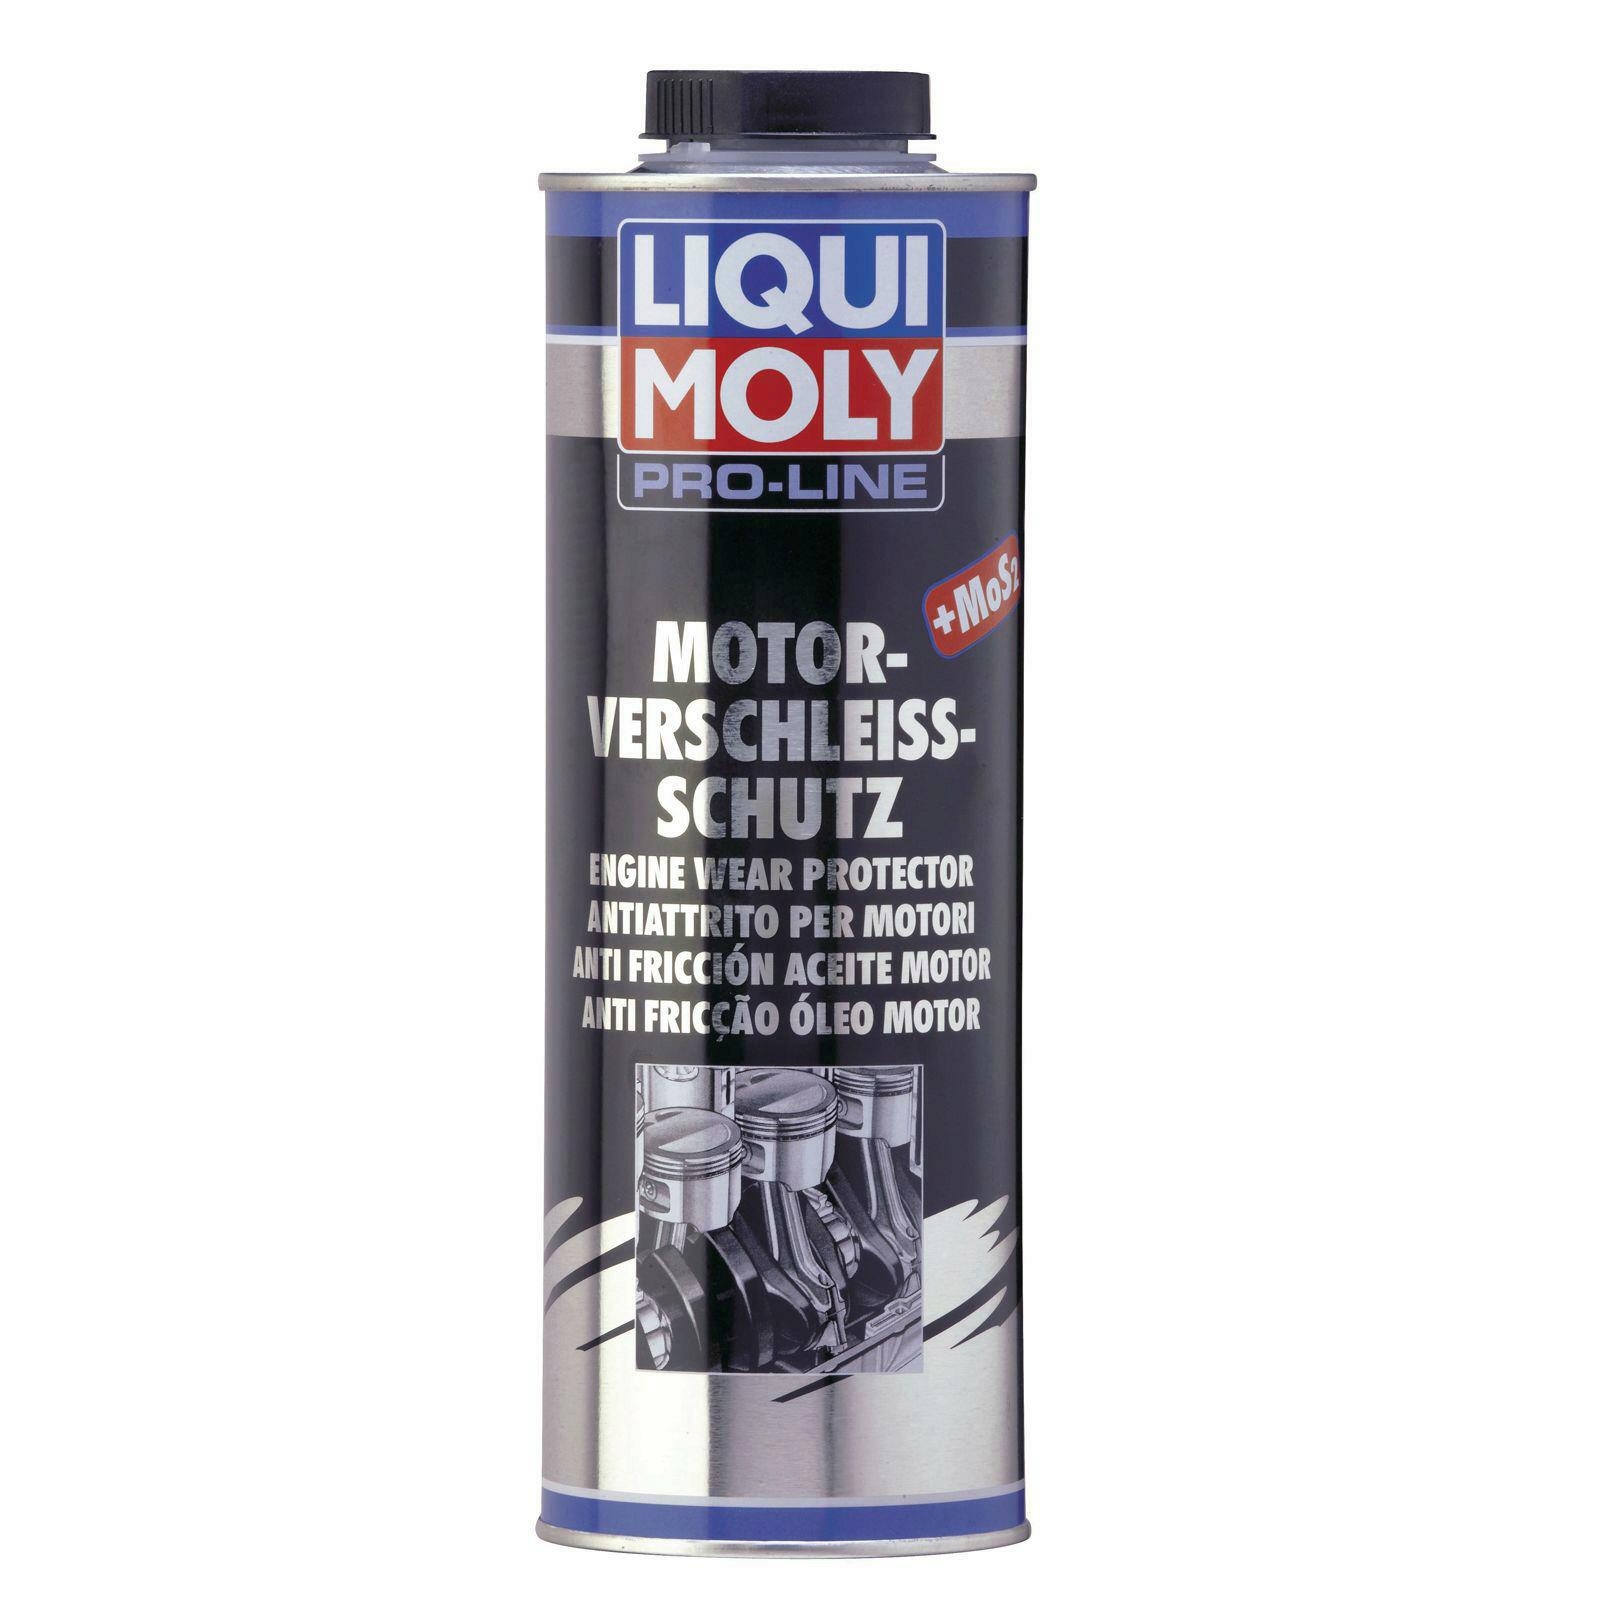 Liqui Moly Pro-Line Motor Verschleiß Schutz 1l